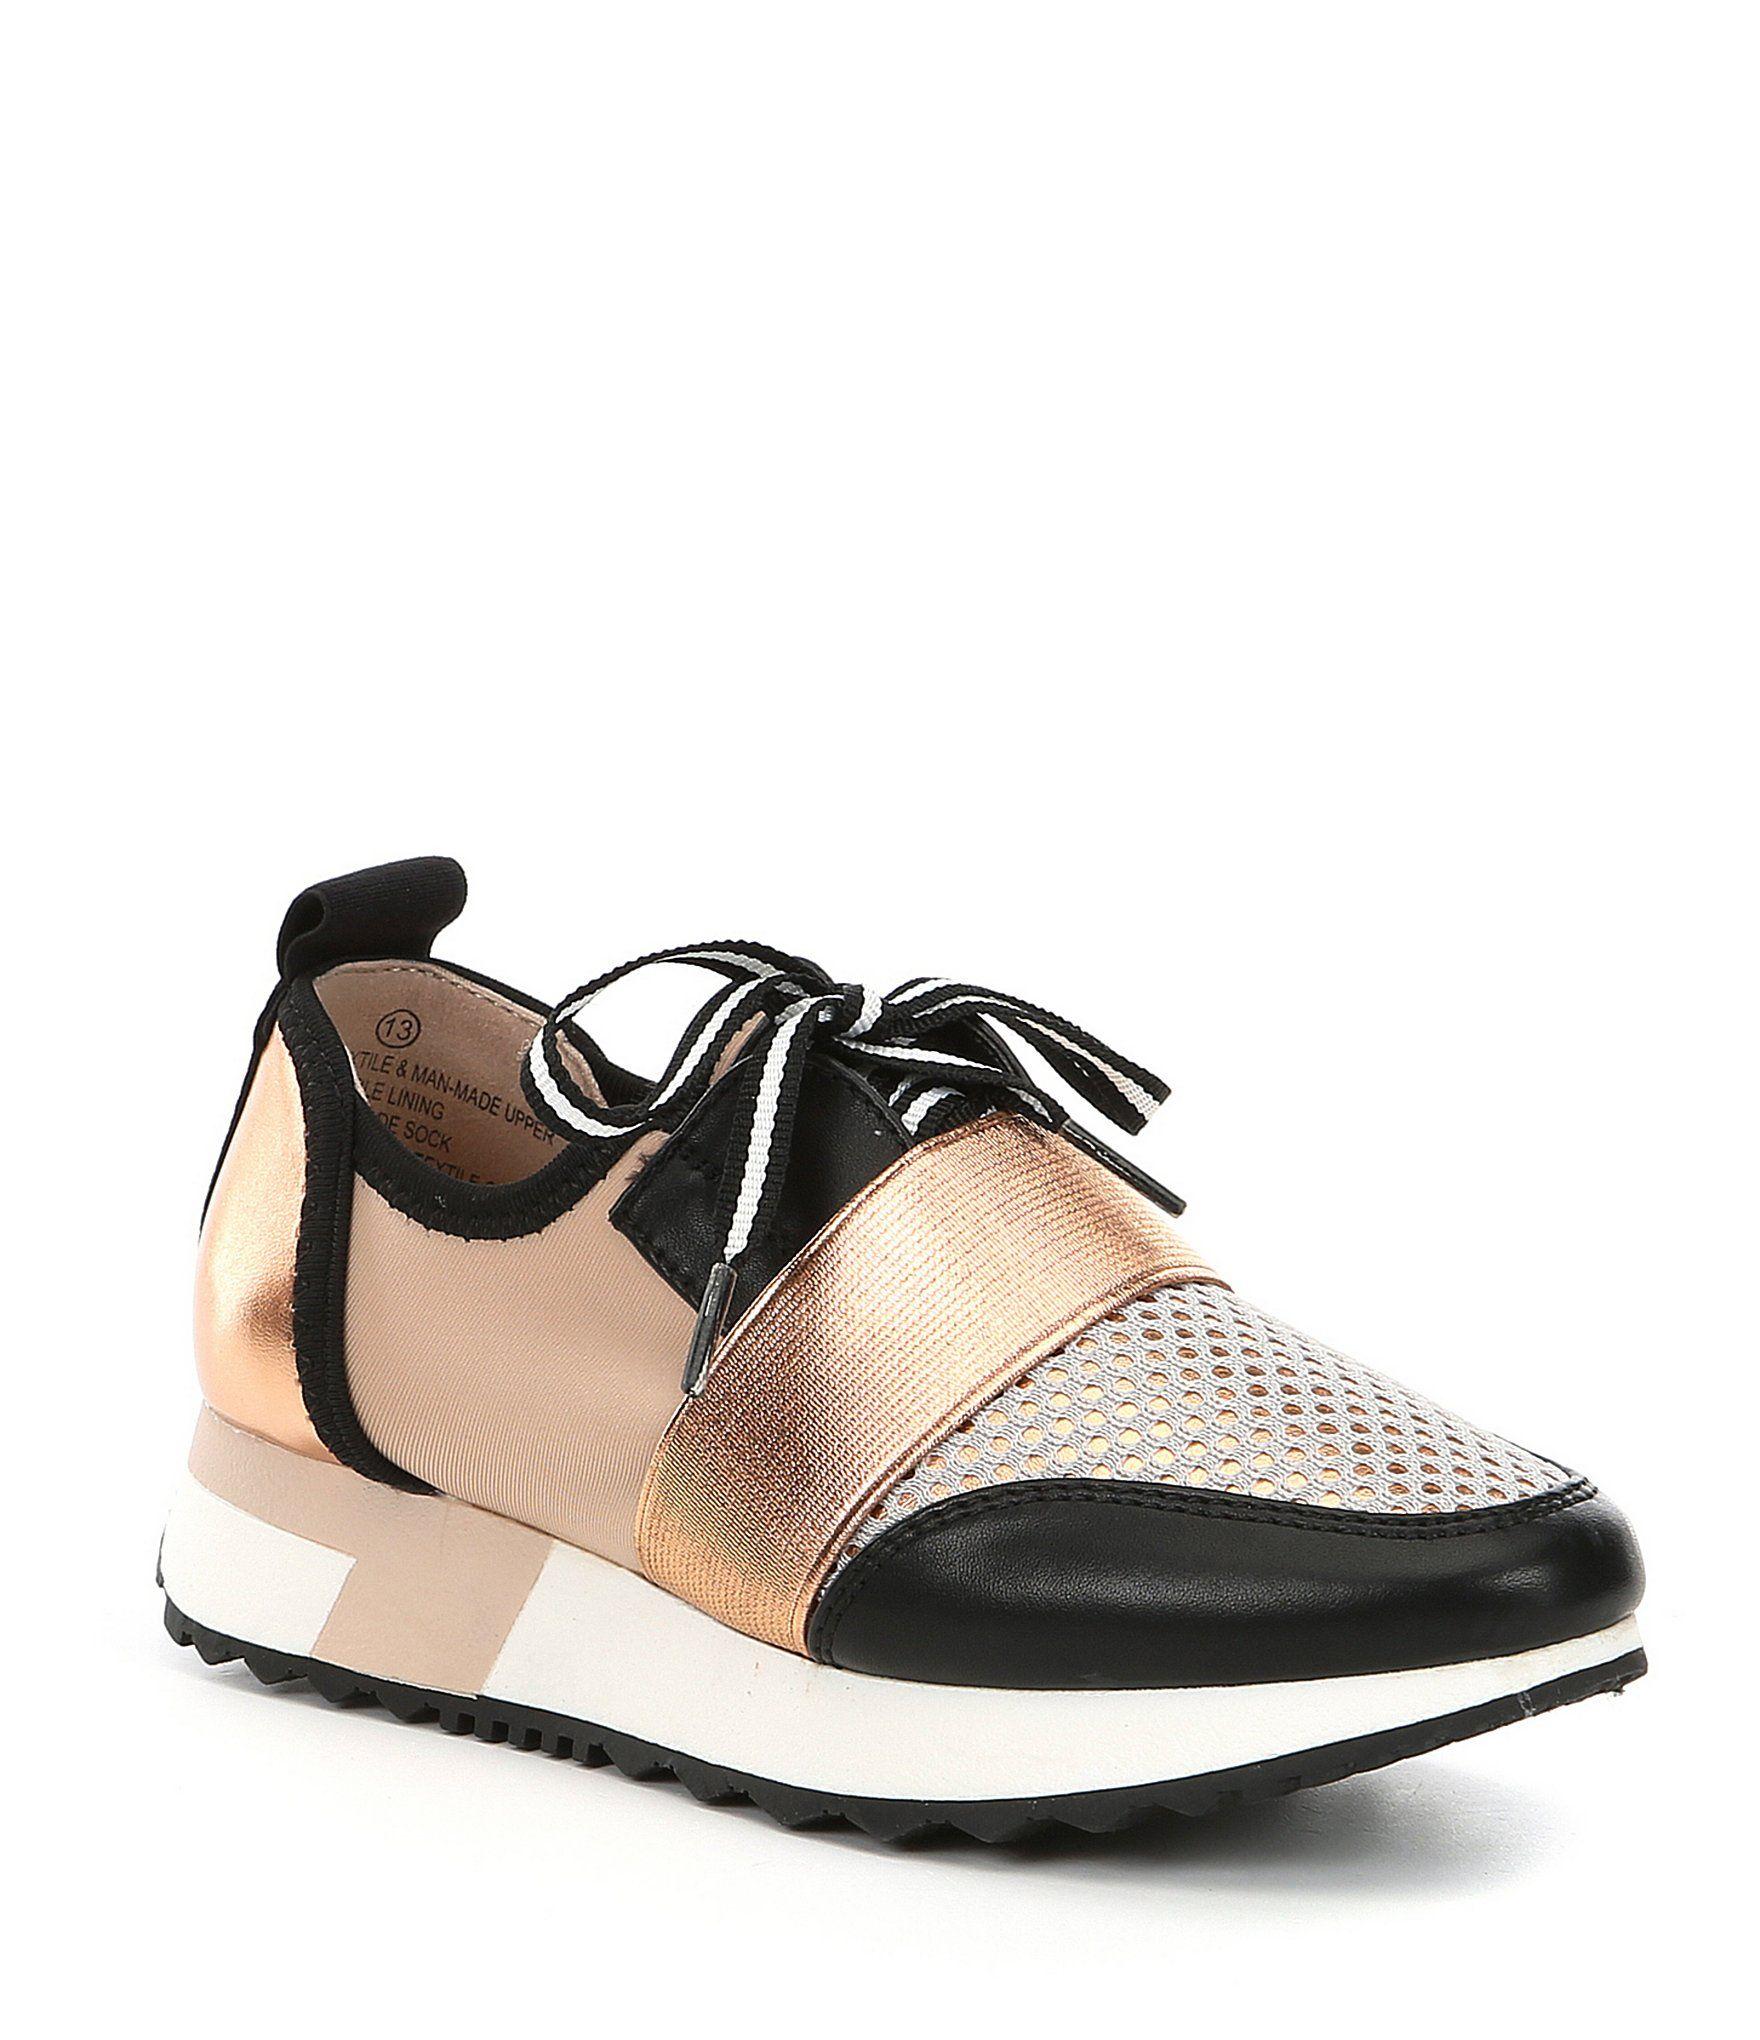 J-Antics Metallic Sneakers